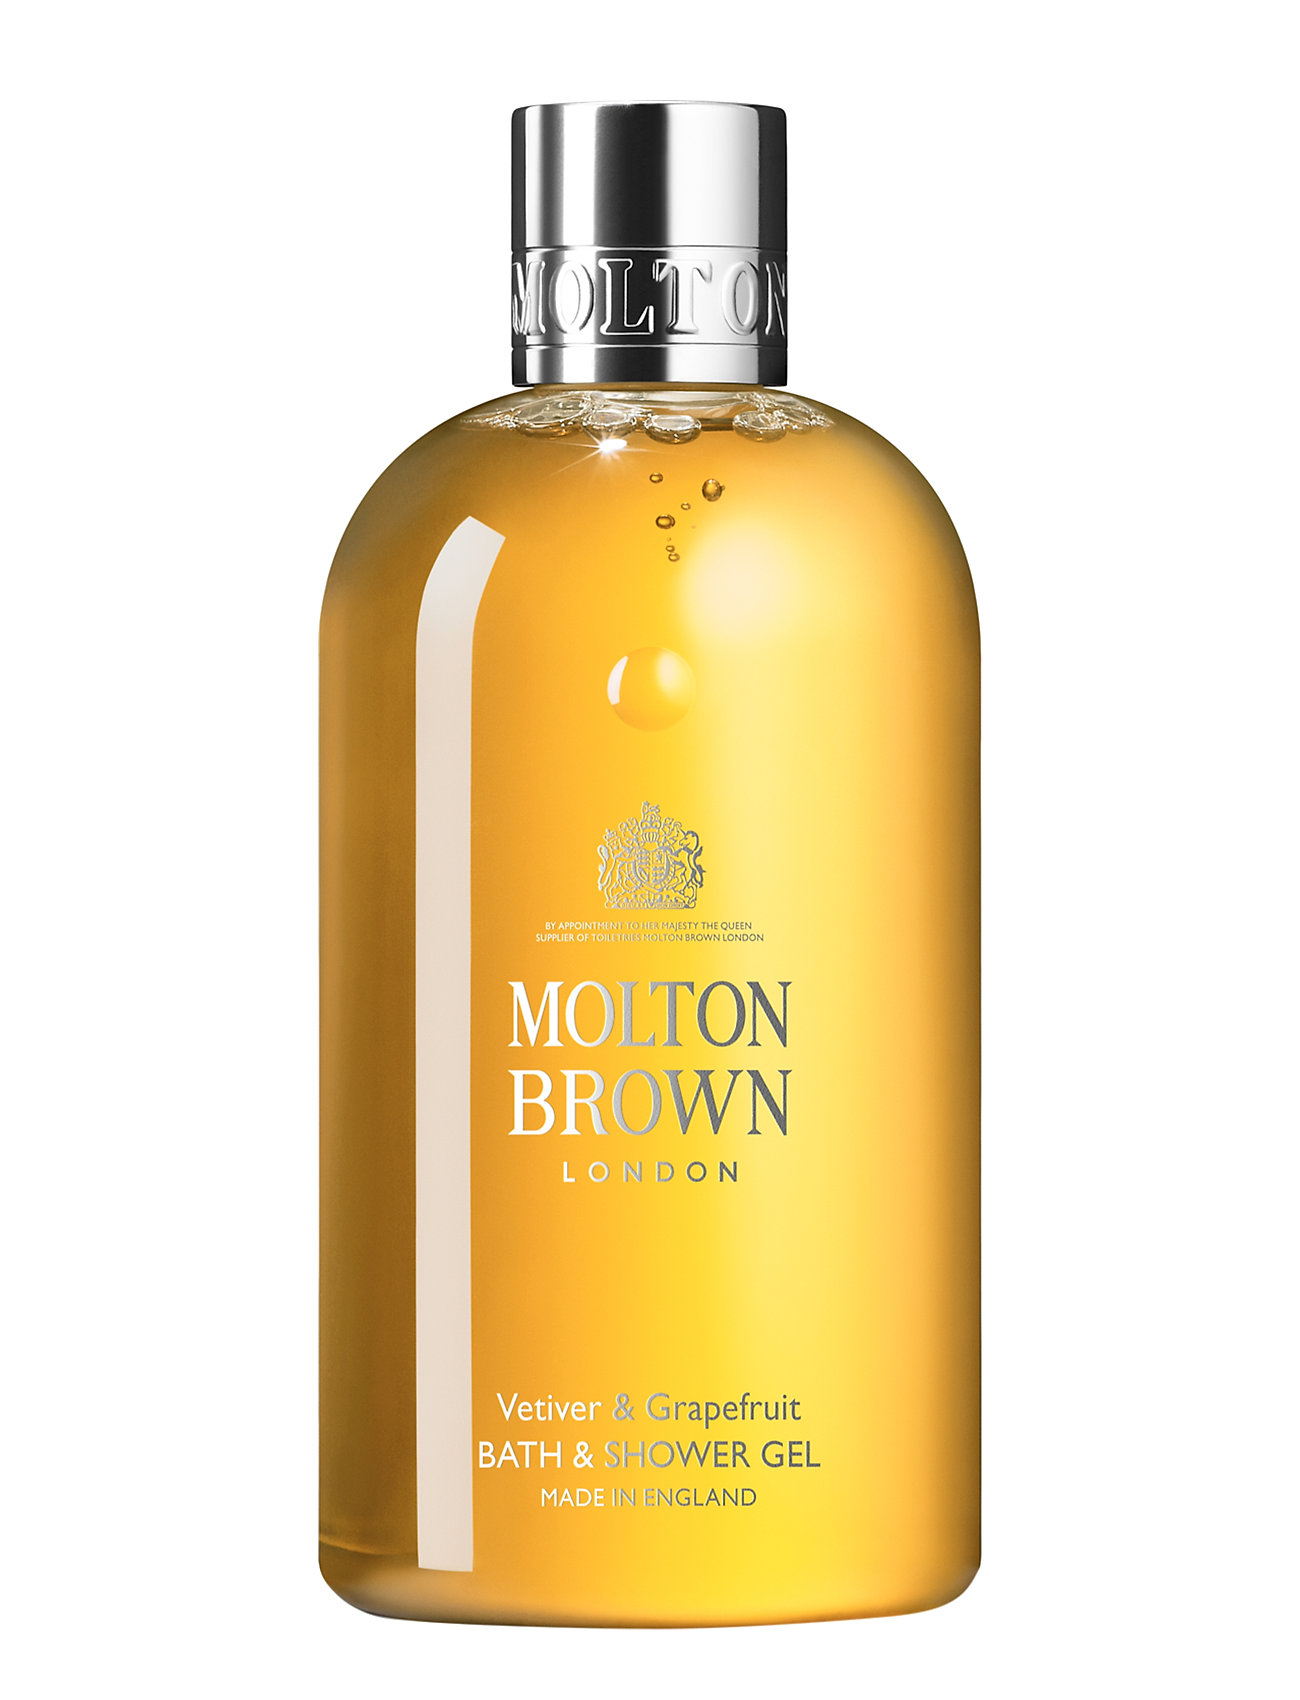 Molton Brown Vetiver & Grapefruit Bath & Shower Gel - NO COLOUR